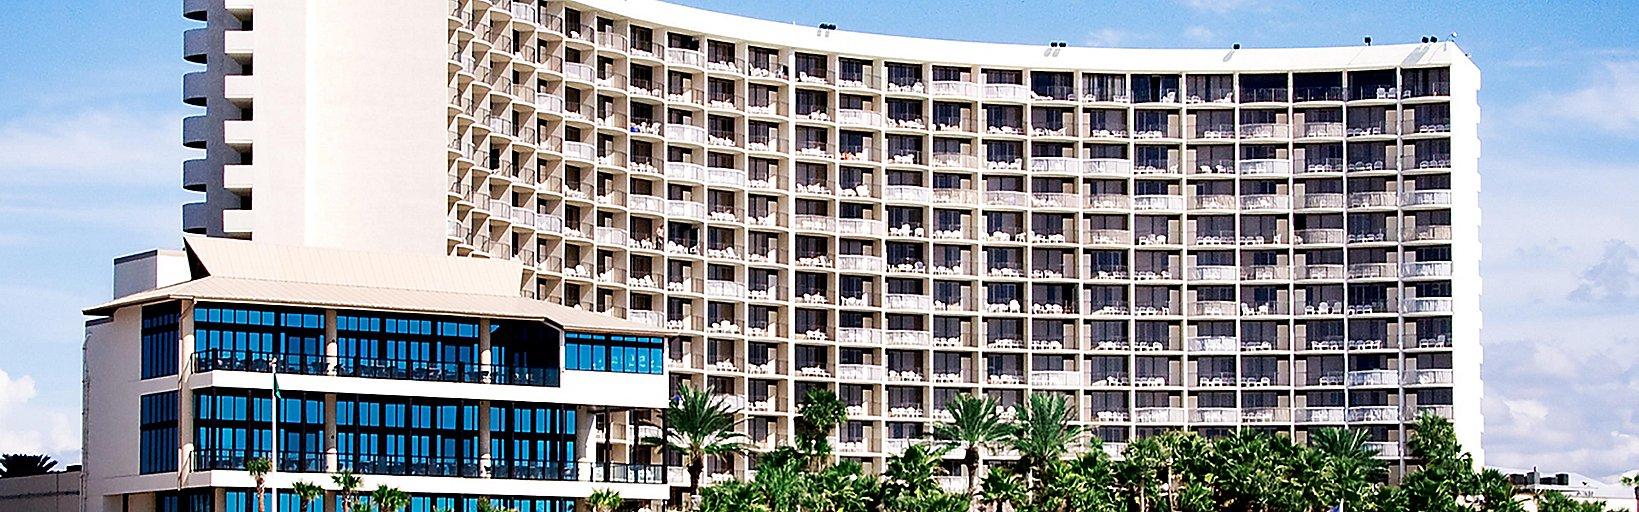 Panama City Beach Hotels >> Holiday Inn Resort Panama City Beach Hotel By Ihg